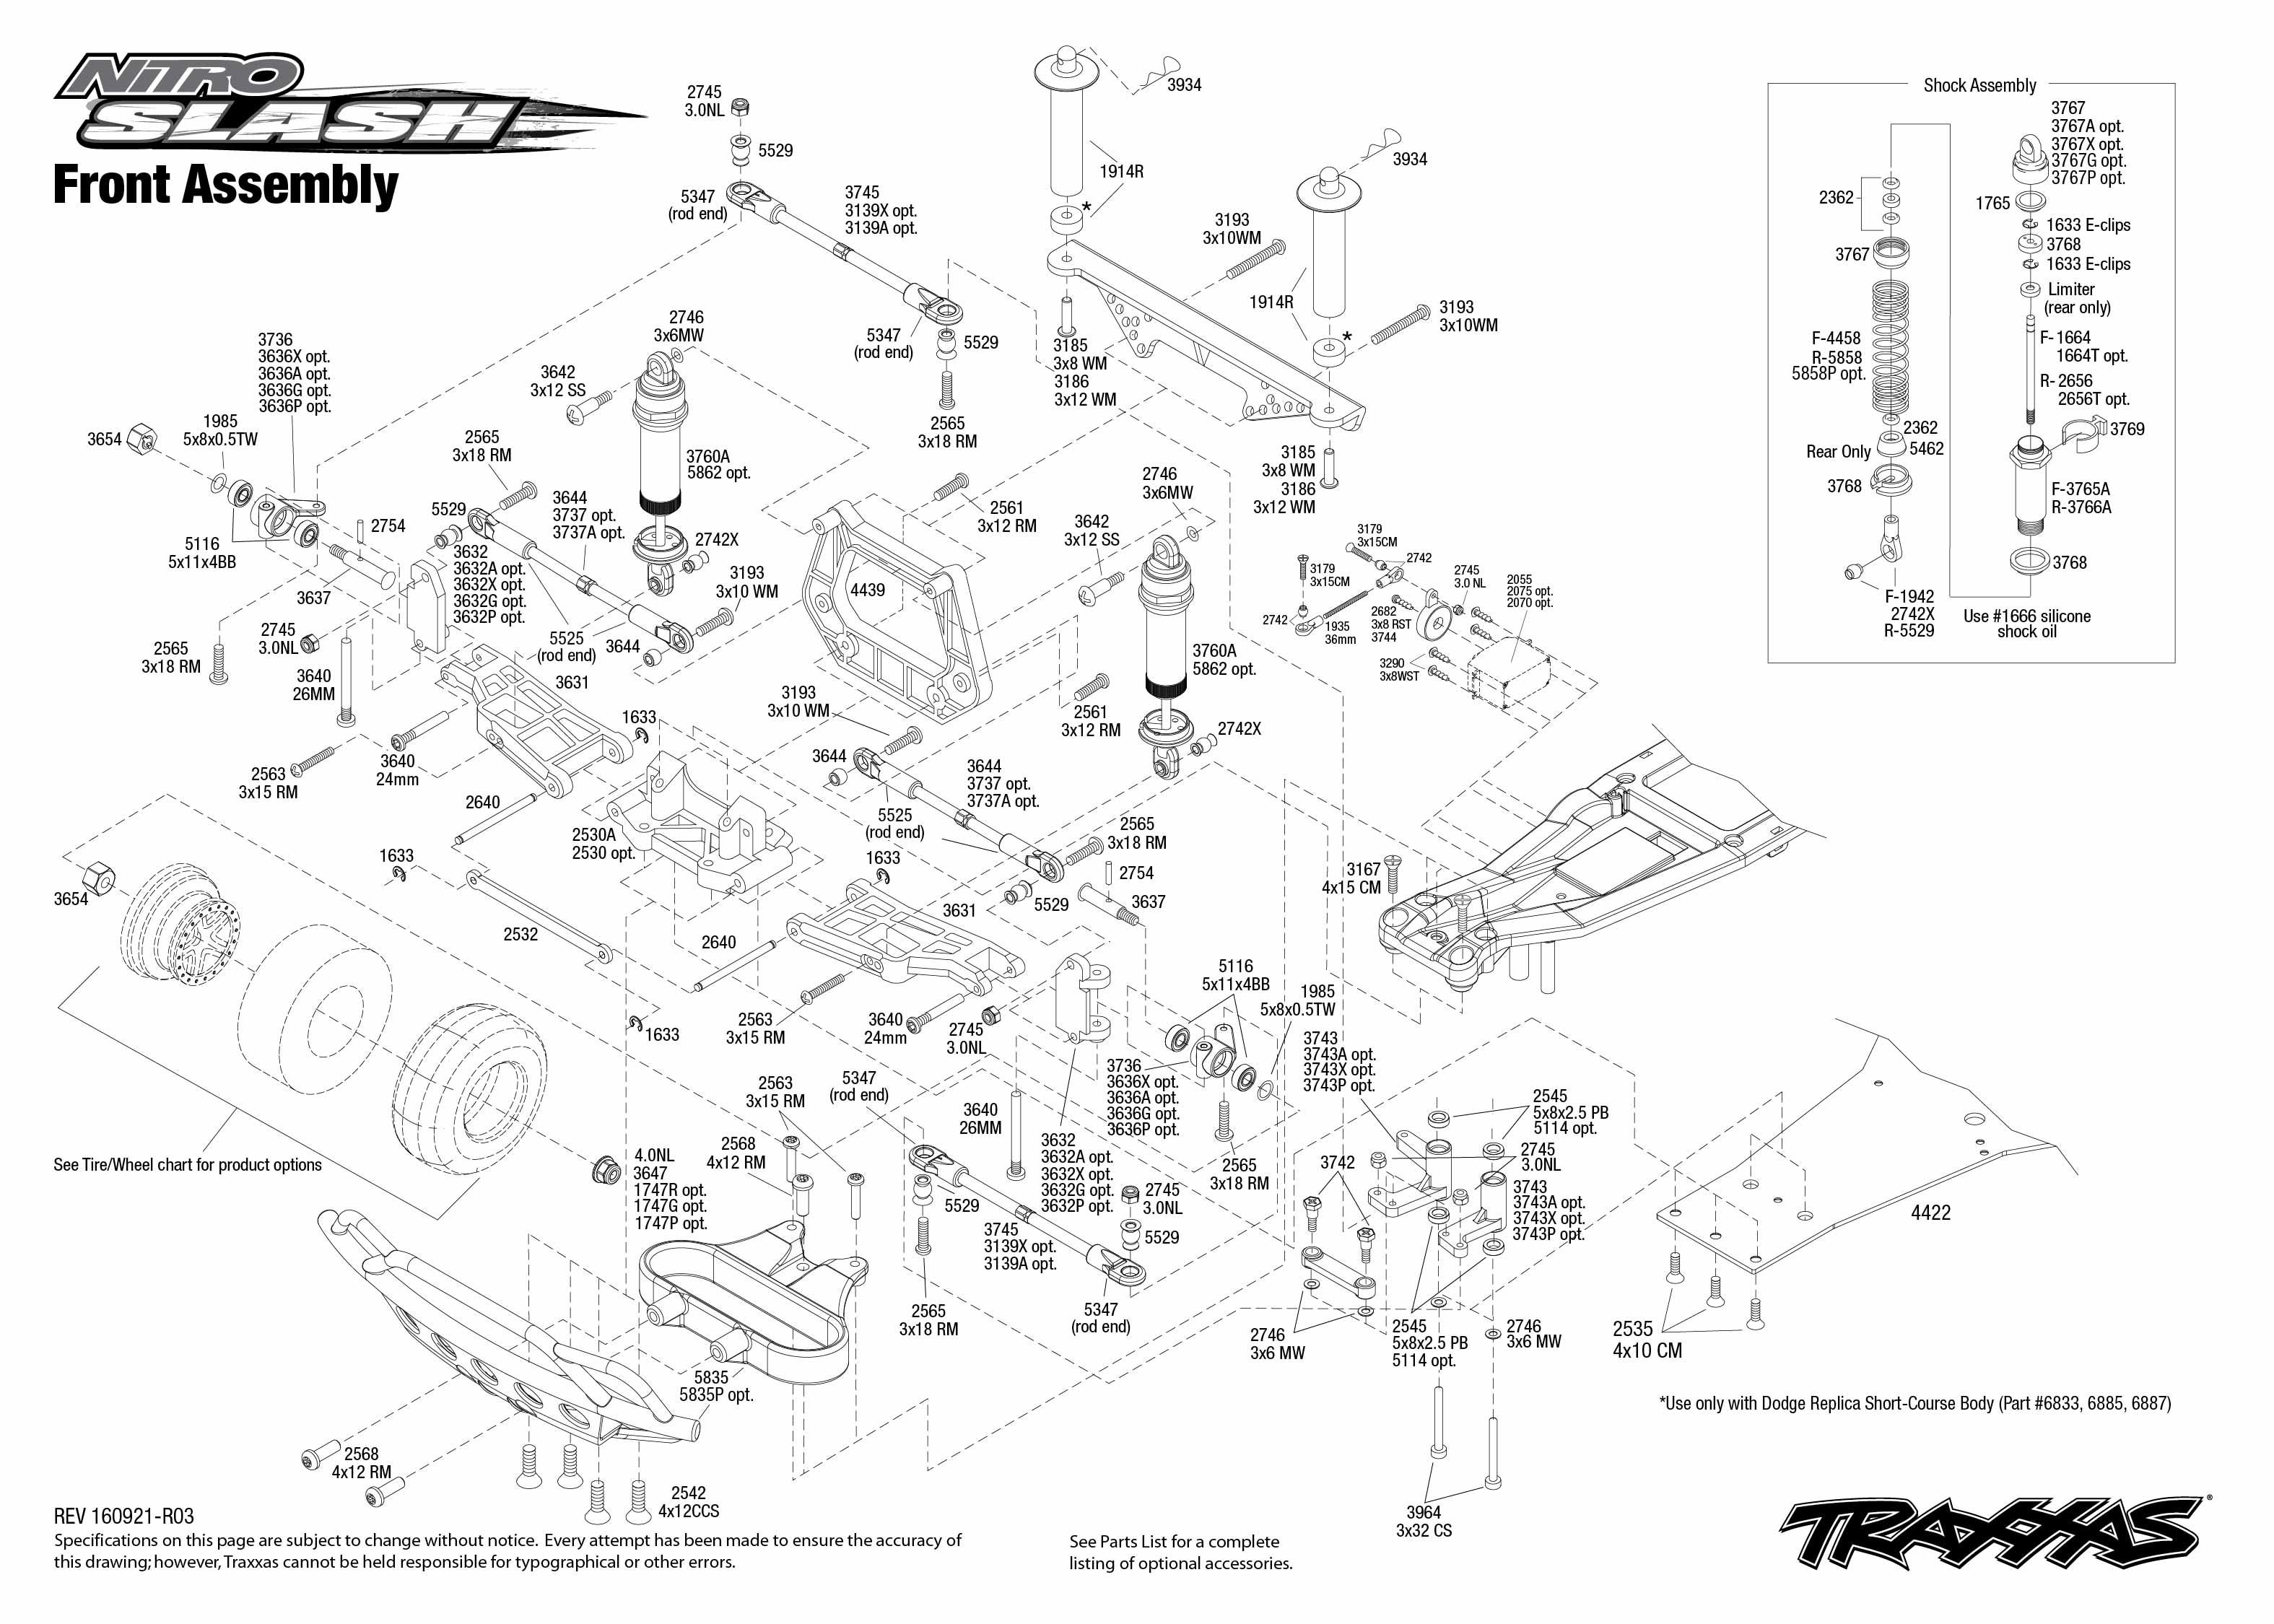 Suzuki Gn 125 H Wiring Diagram Schematic Diagrams 250 Harness Engine Exploded View Traxxas Nitro Slash 1 10 Tqi Rtr Tsm Front Part Astra Tapas La Unidad De